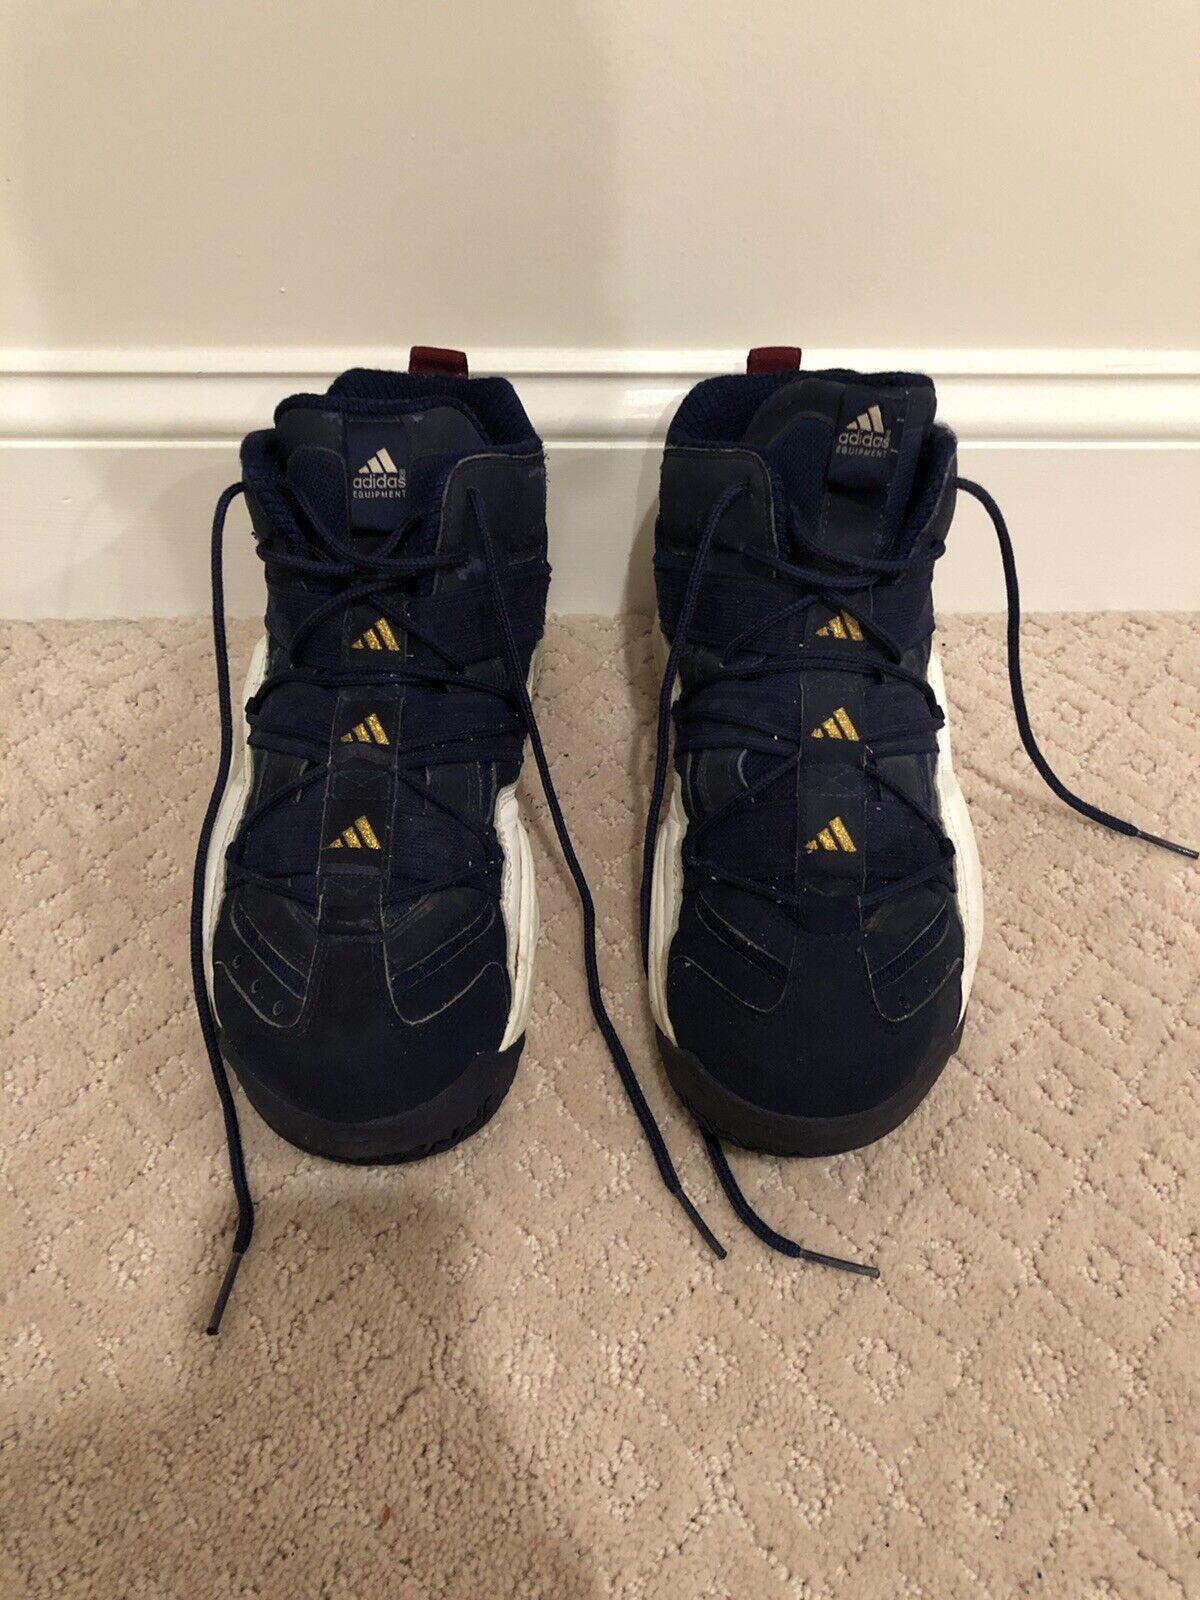 Kobe Bryant Adidas Sneakers. - image 9